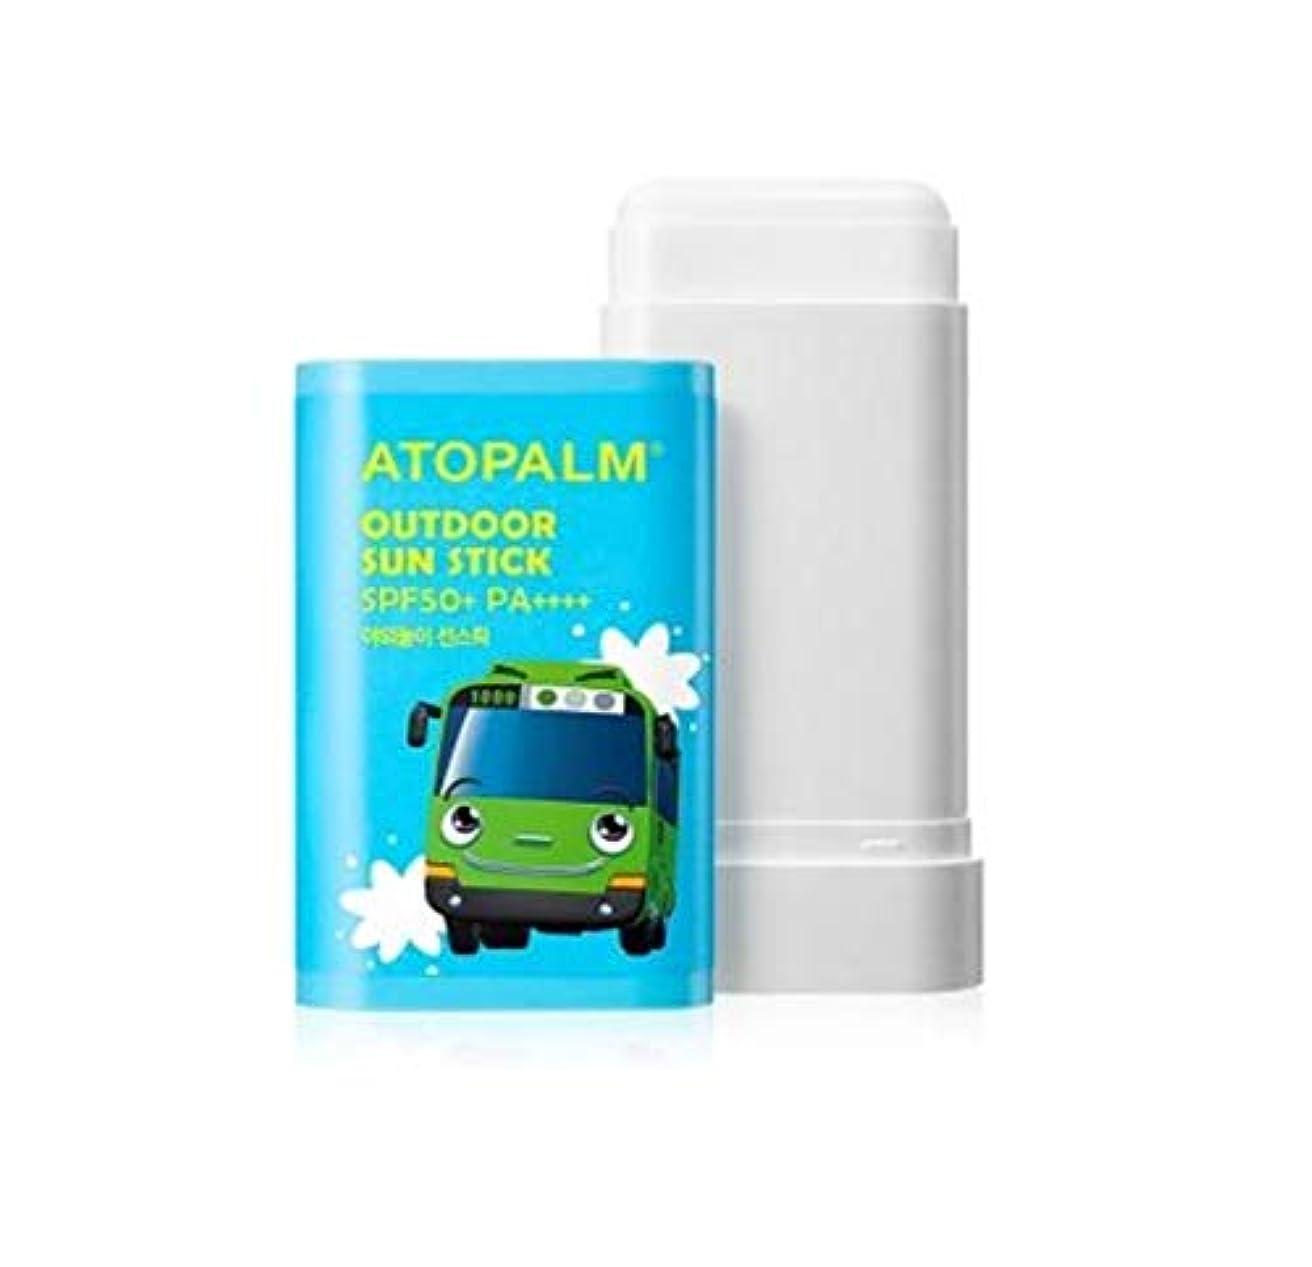 ATOPALM OUTDOOR Sun Stick (EWG all green grade!) SPF50+ PA++++ 日焼け止めパーフェクトUVネック?手?足の甲?部分的に塗って修正スティック [並行輸入品]